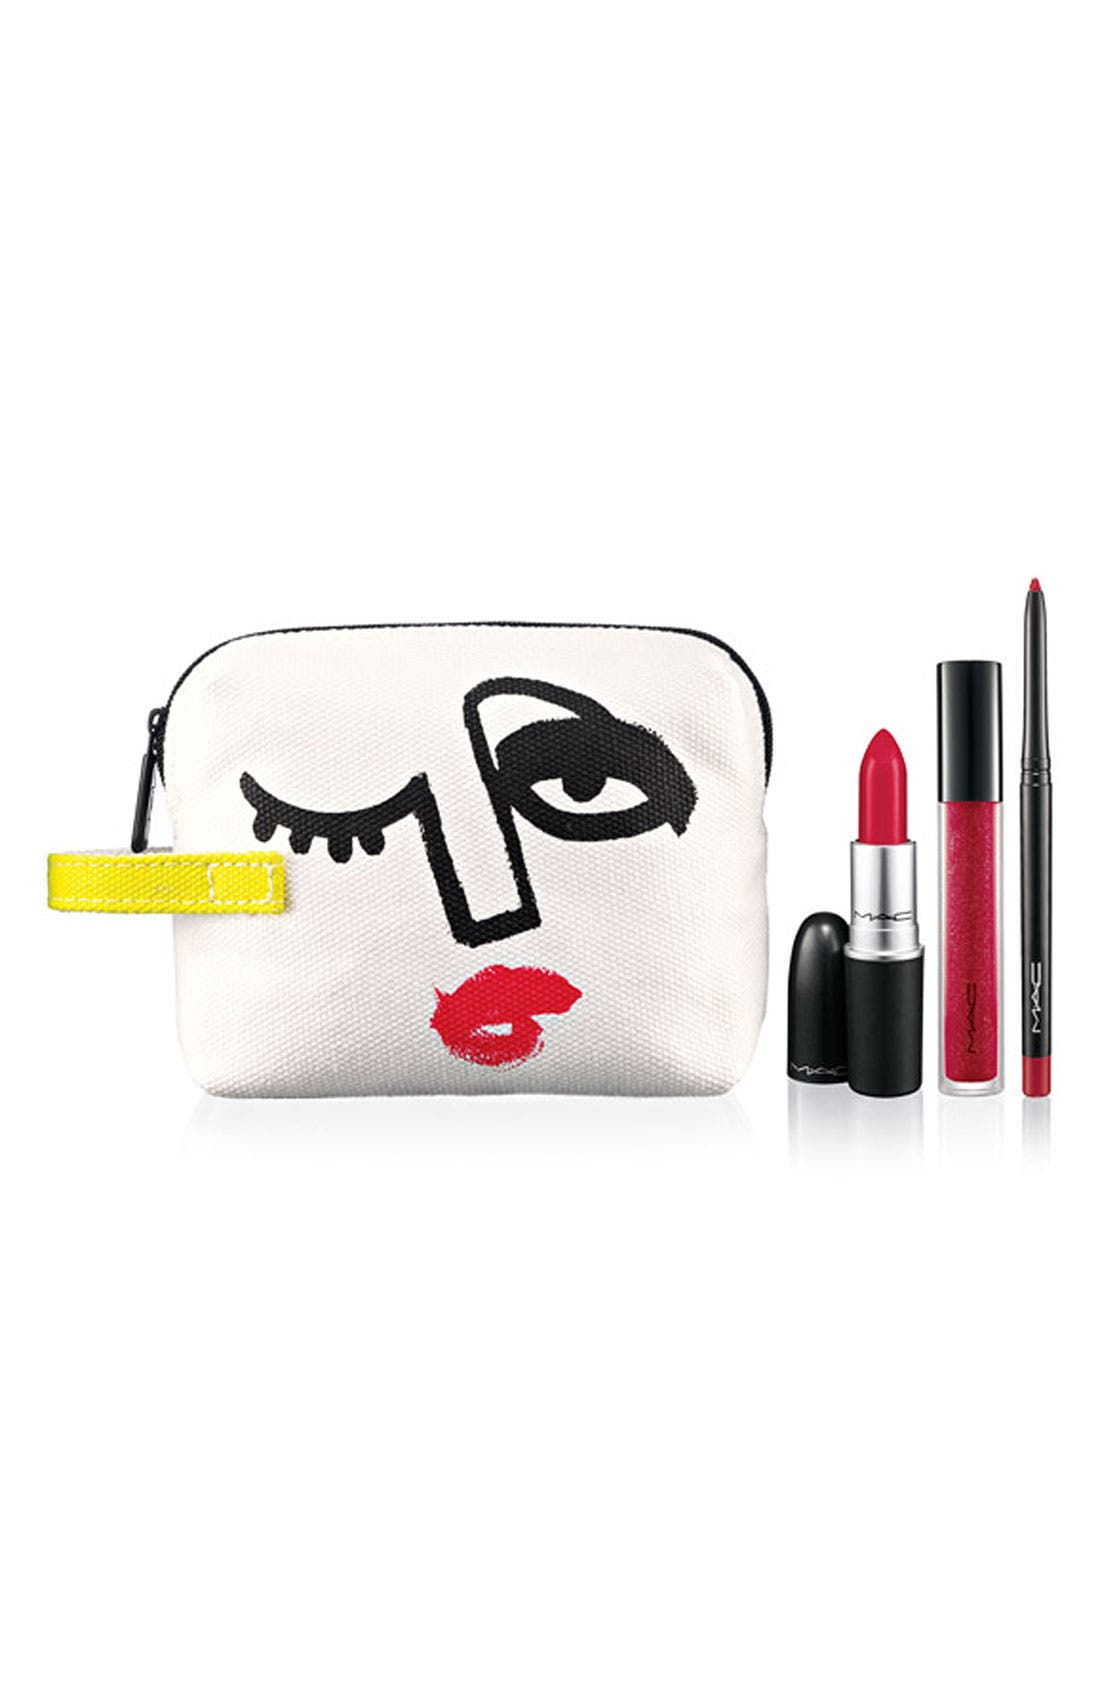 M·A·C 'Illustrated - Red x3' Lip Color & Bag by Julie Verhoeven,                             Main thumbnail 1, color,                             000